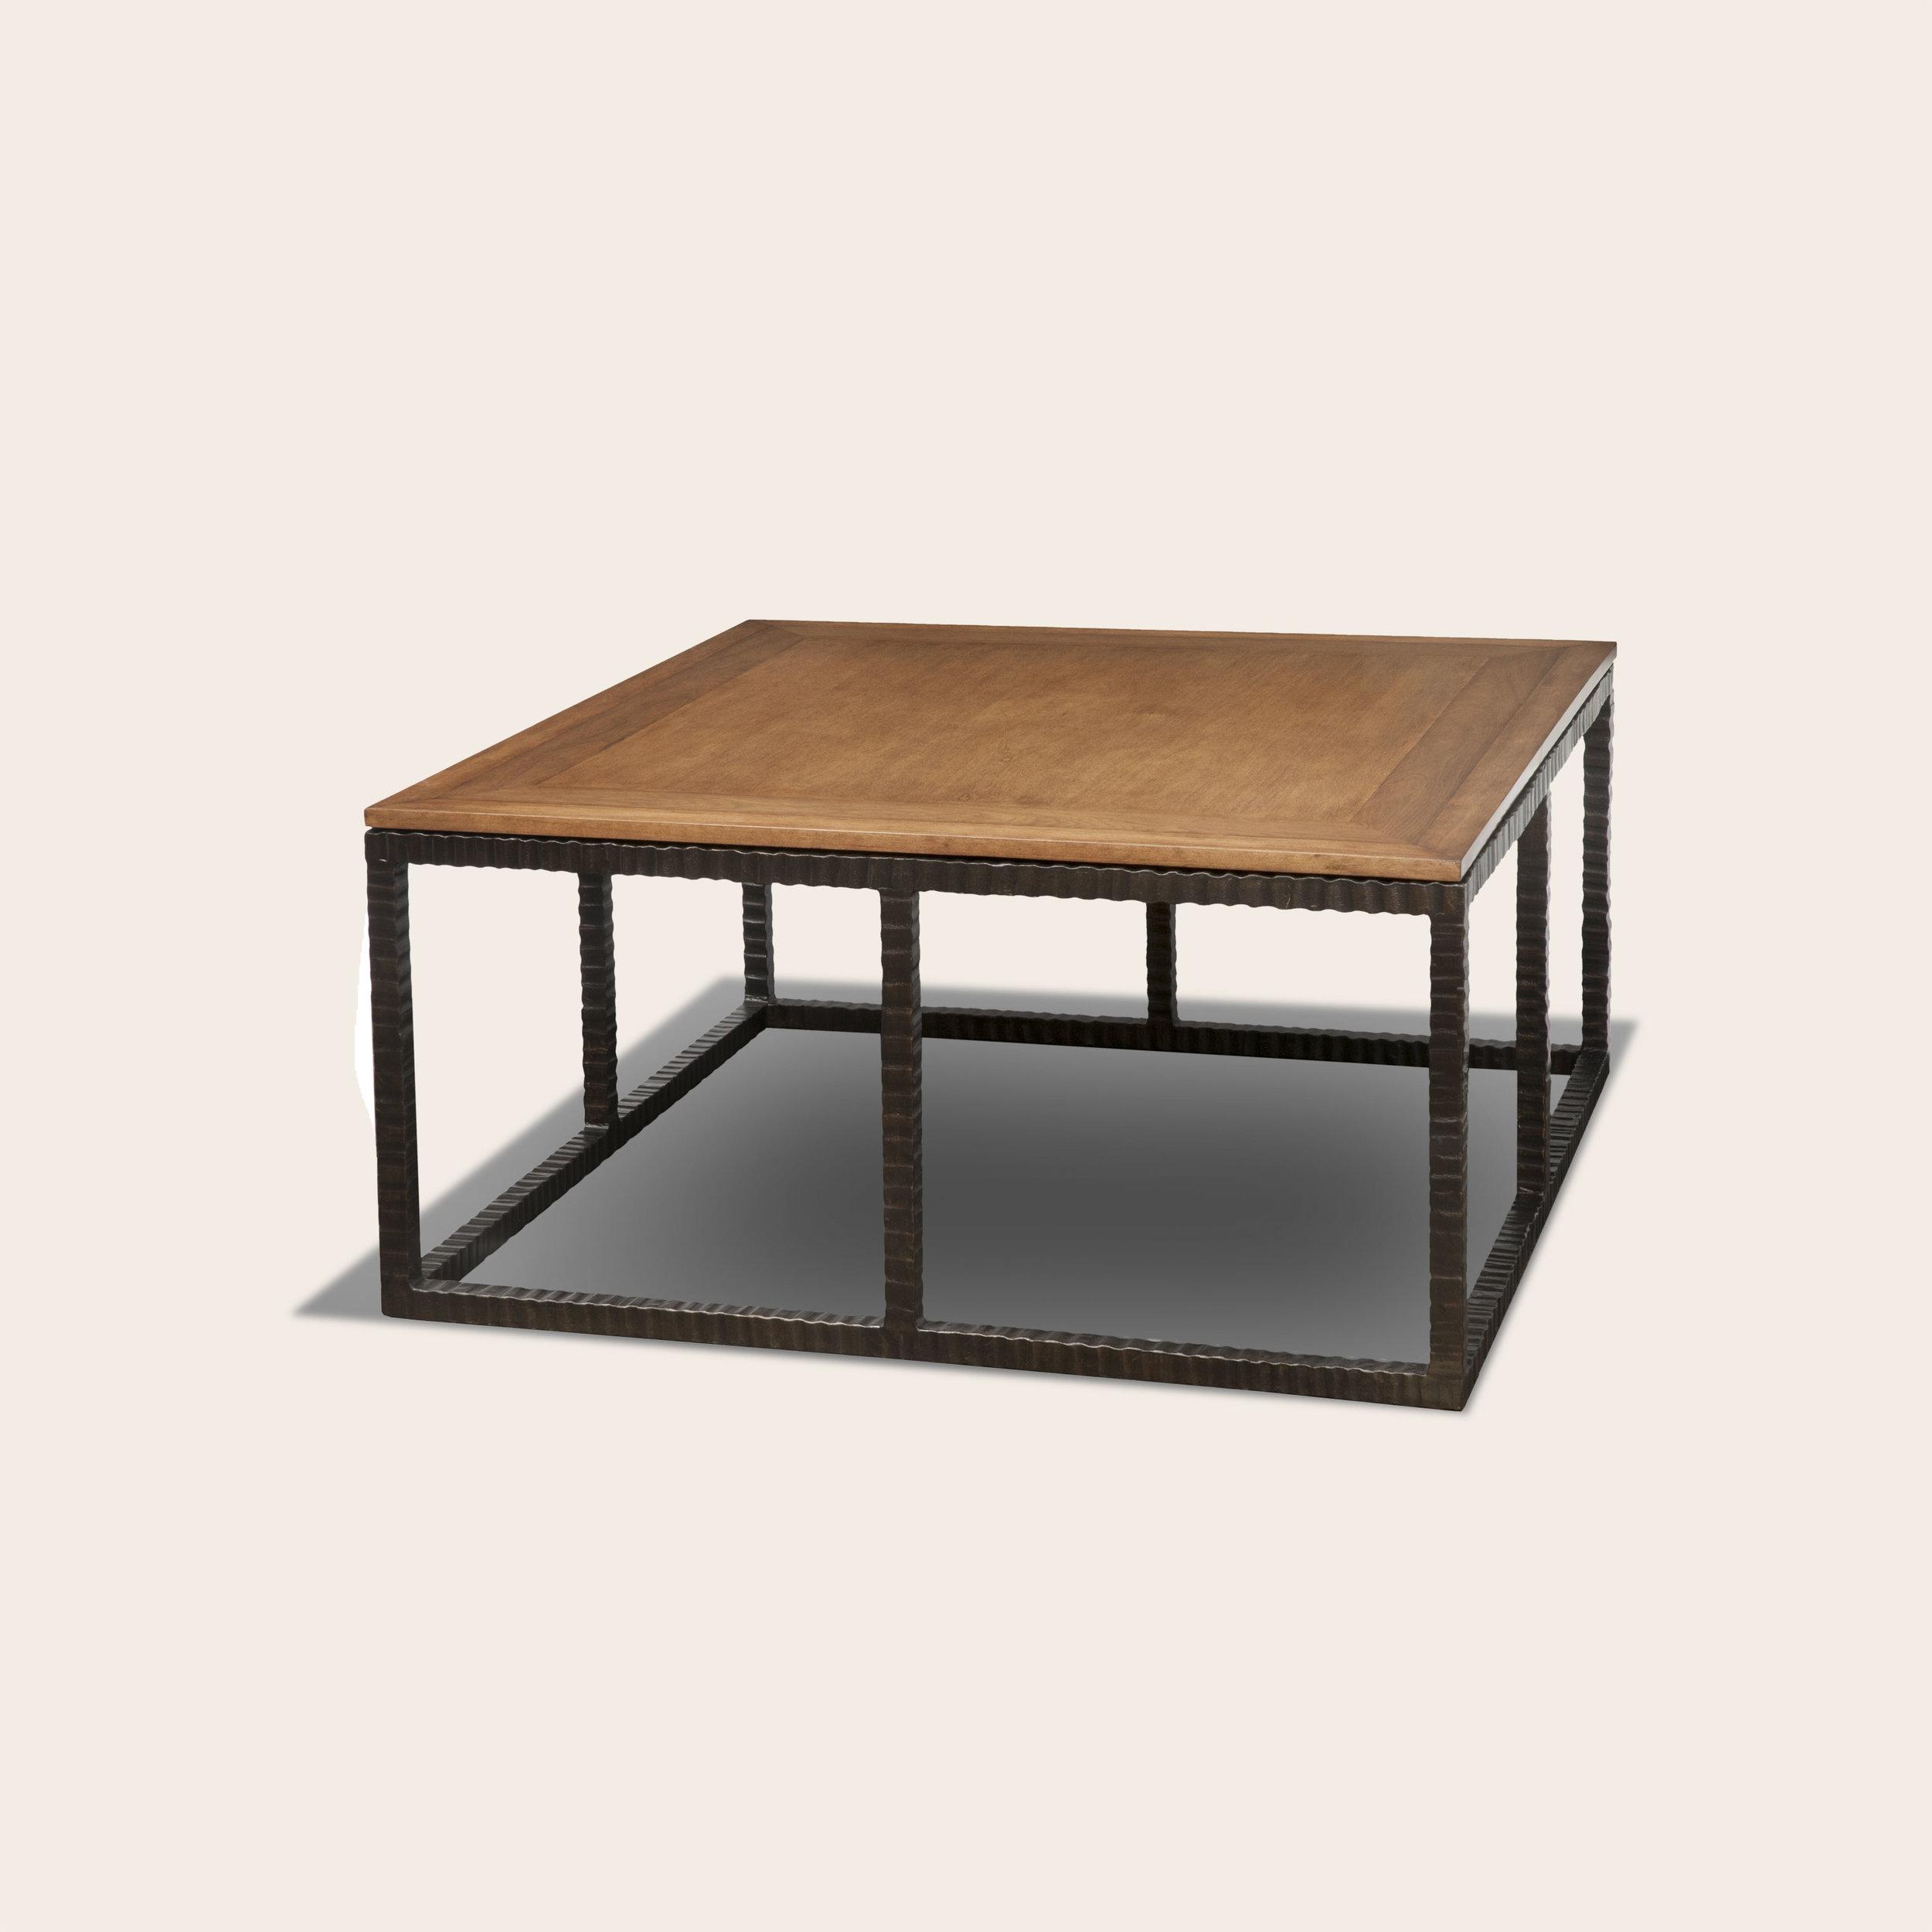 Manolo-Coffee-Table-CM-311.jpg